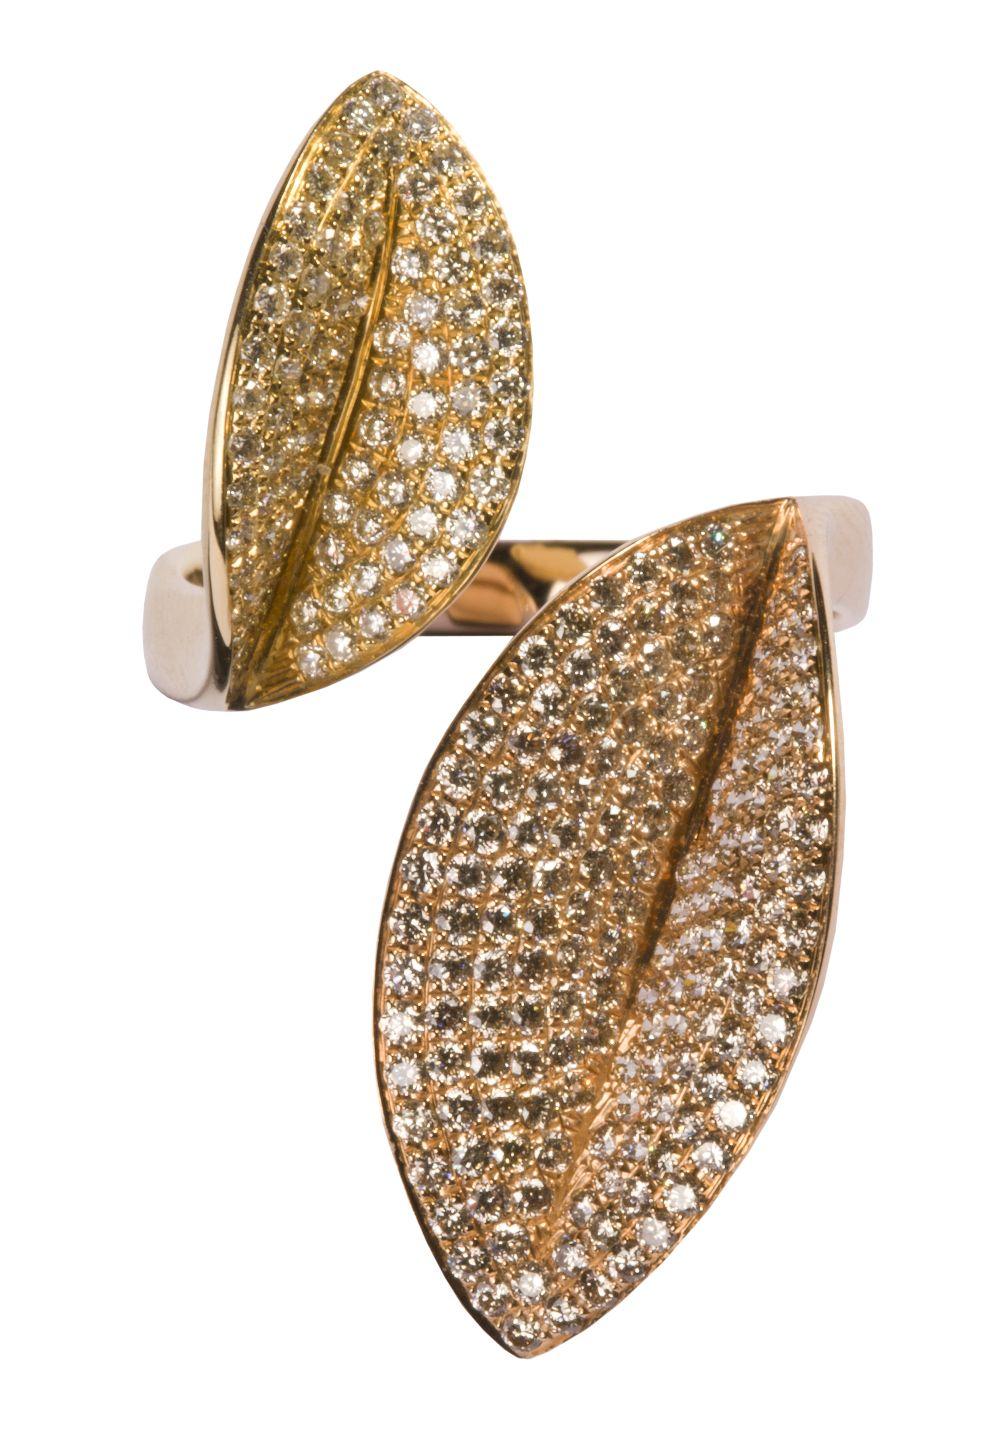 #79 Rose Golden Ring | Roségoldener Ring Image